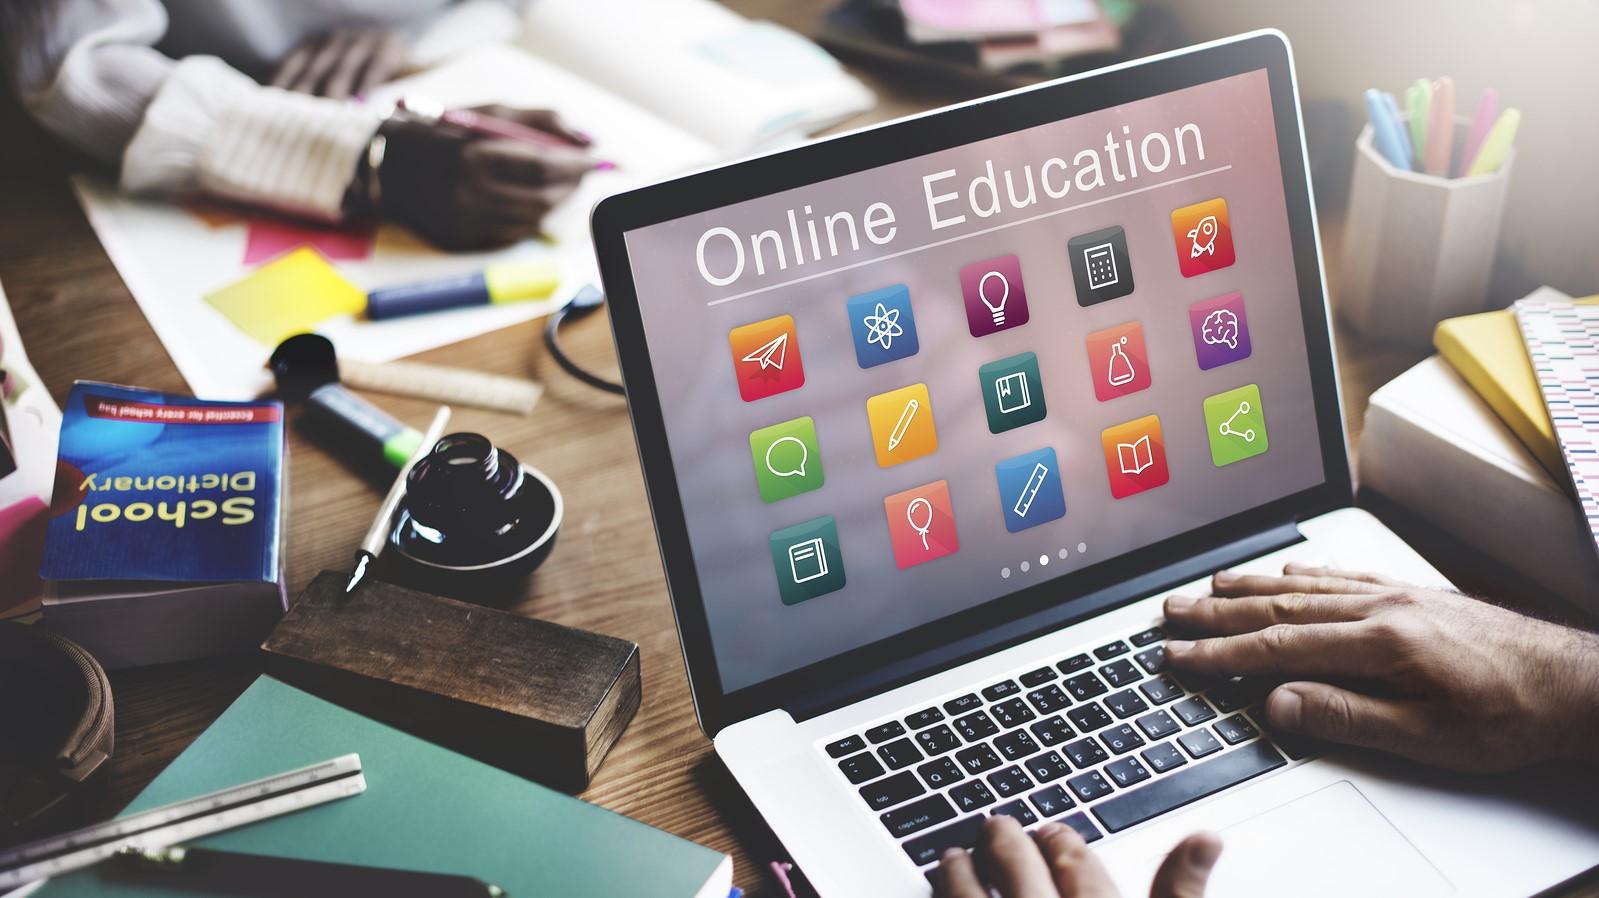 Top Online Education Trends